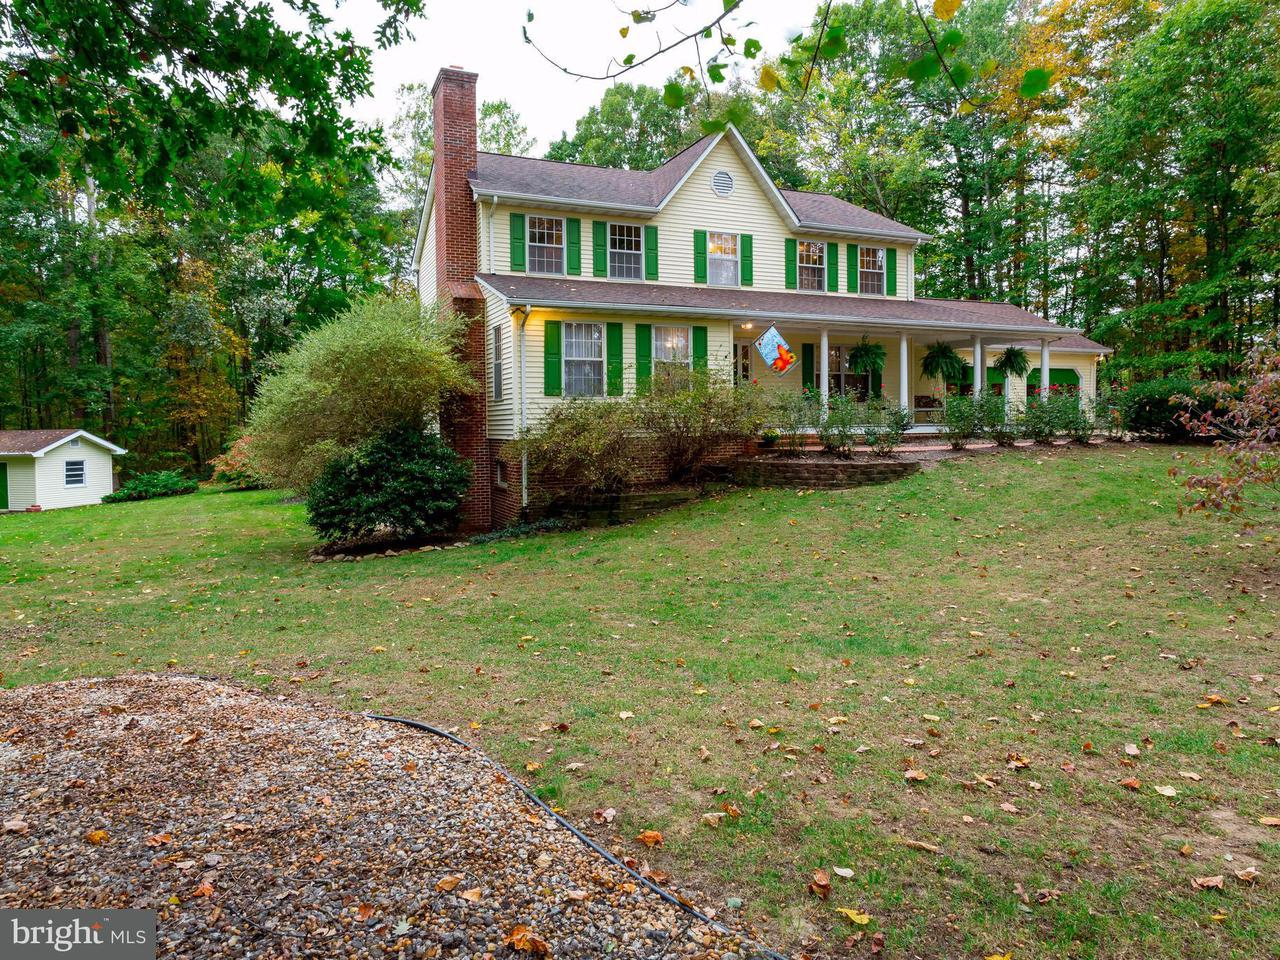 Casa Unifamiliar por un Venta en 13390 Cameron Court 13390 Cameron Court Boston, Virginia 22713 Estados Unidos